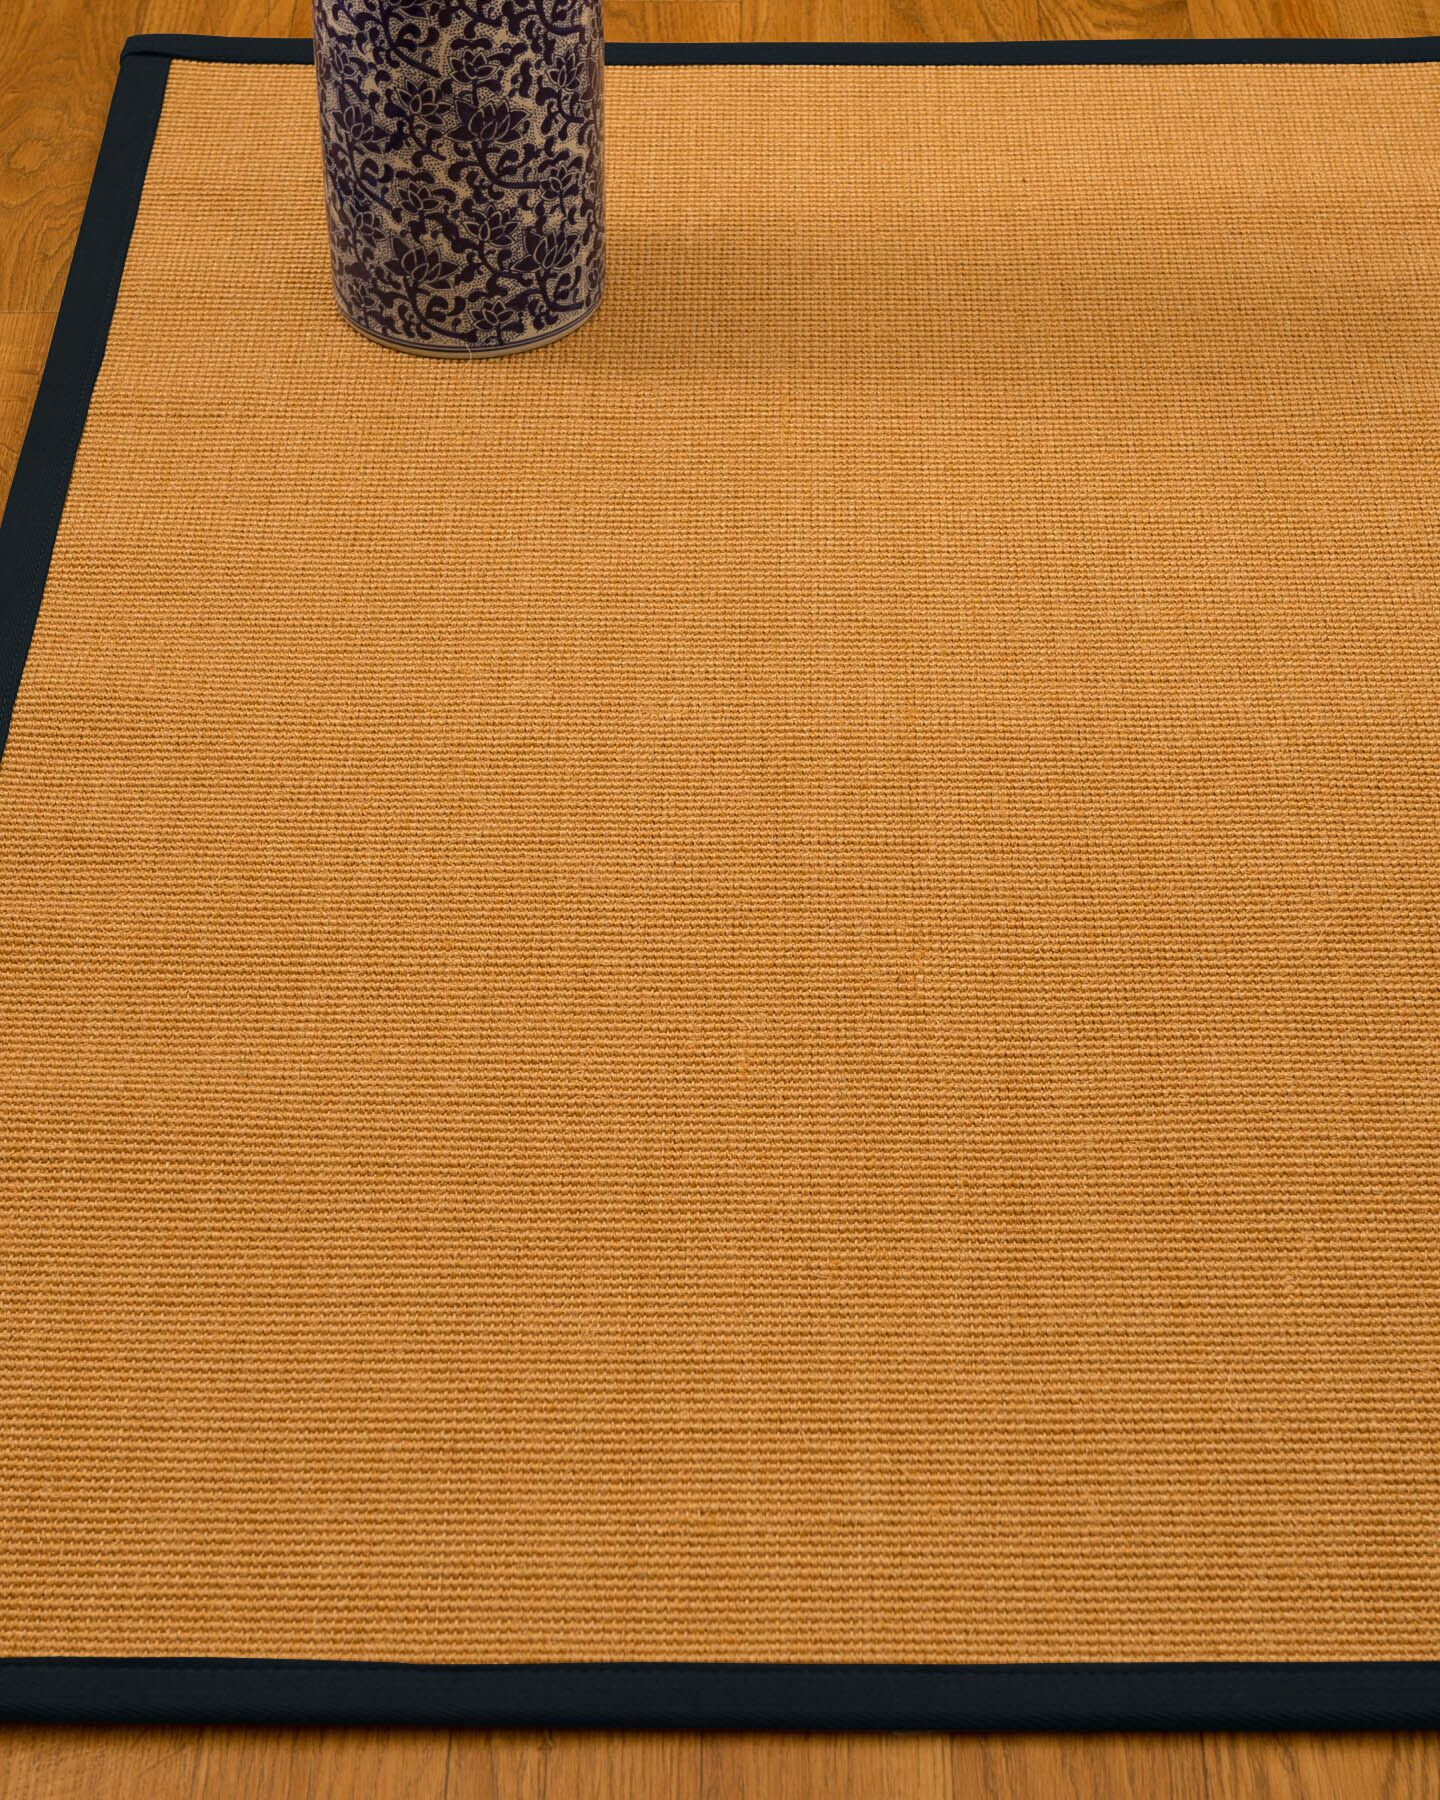 Gregory Hand-Woven Beige Area Rug Rug Size: Rectangle 8' x 10'